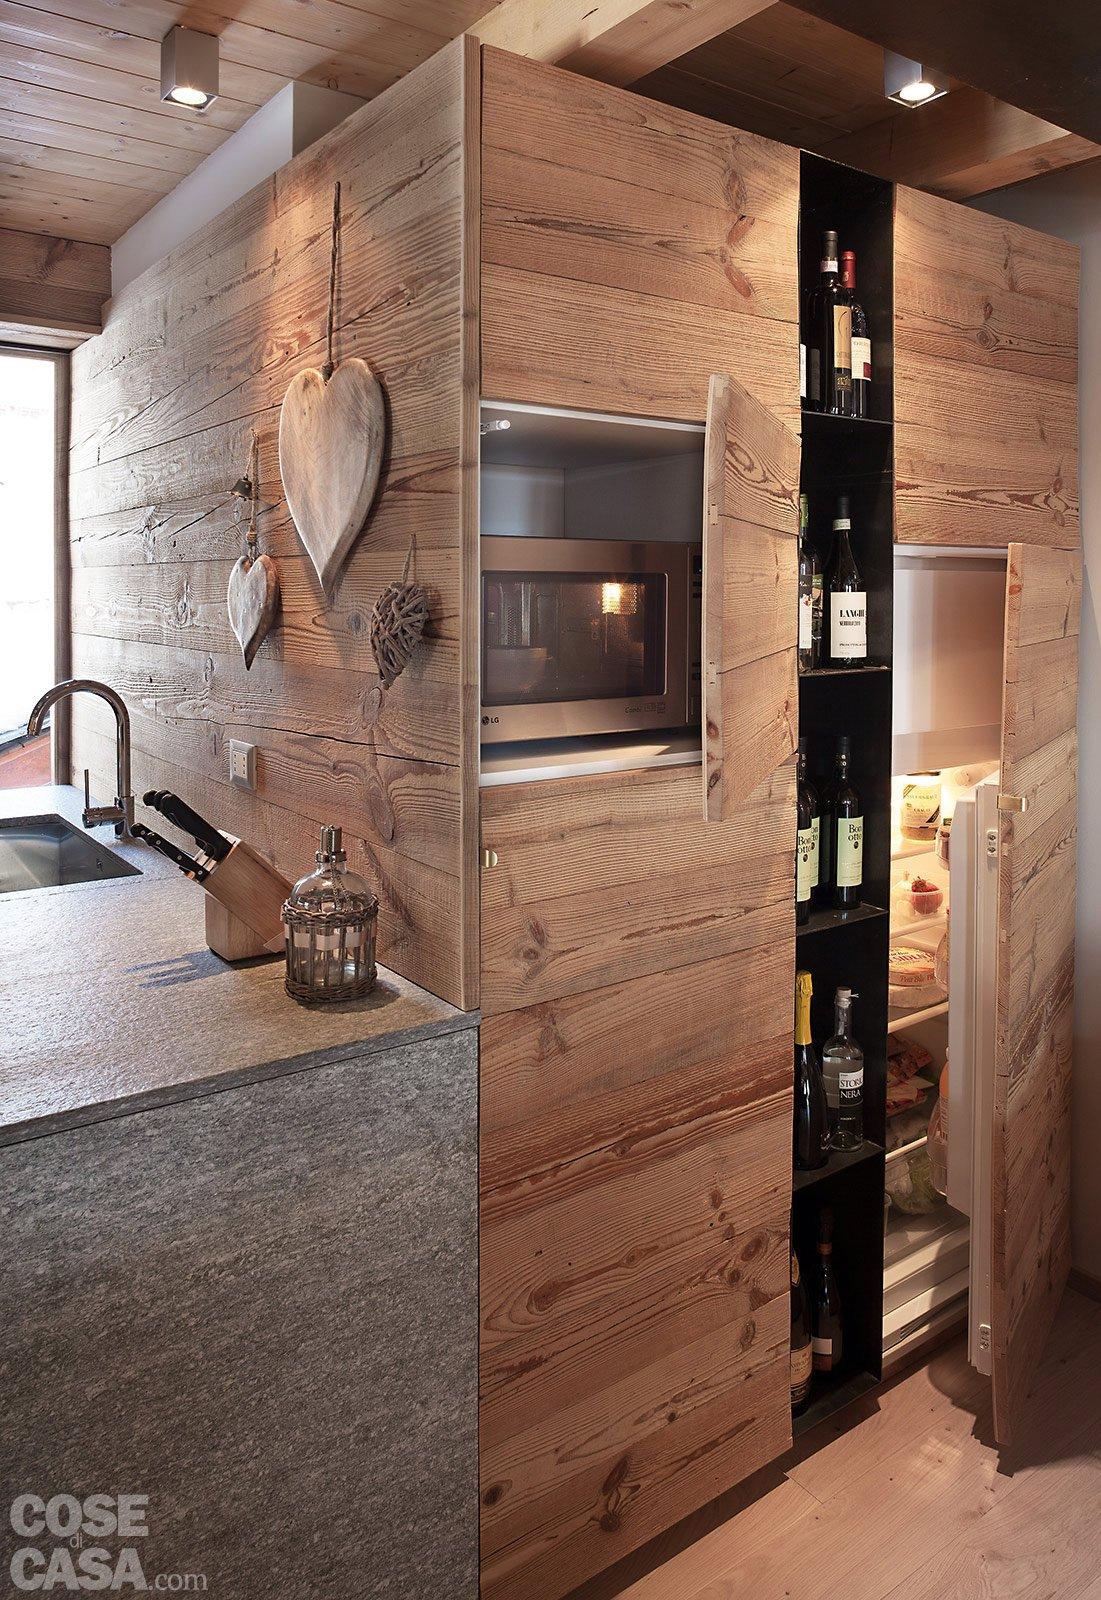 Atmosfera da chalet in una casa moderna cose di casa for Interni di baite